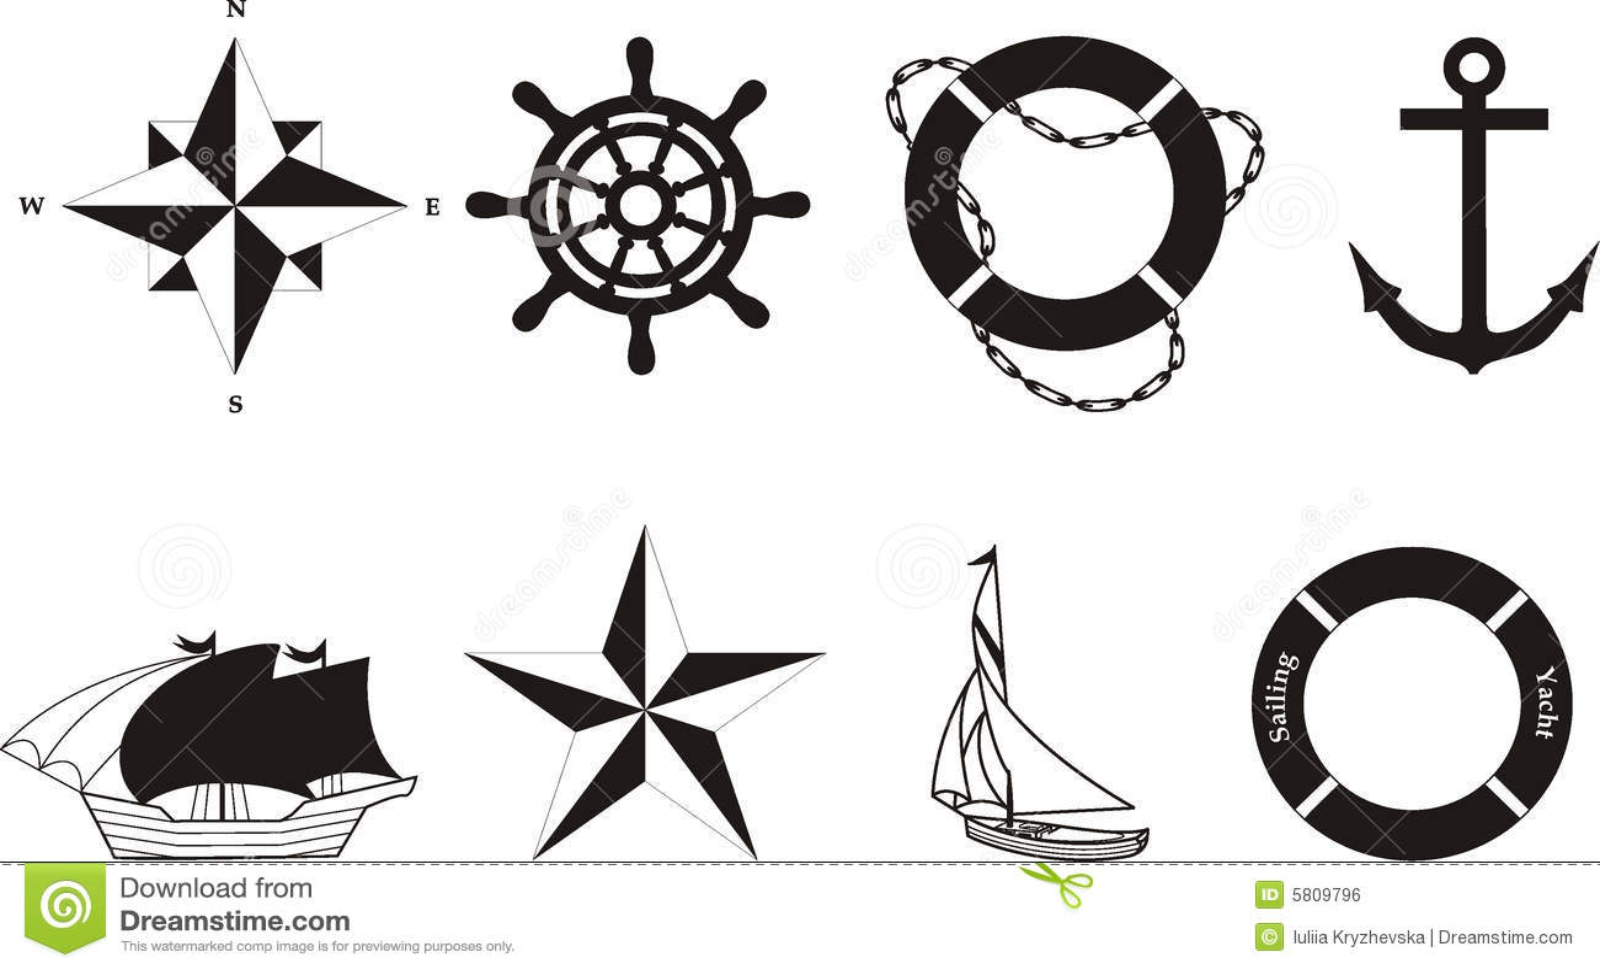 Nautical Vector Amp Rasterized Symbols Stock Vector